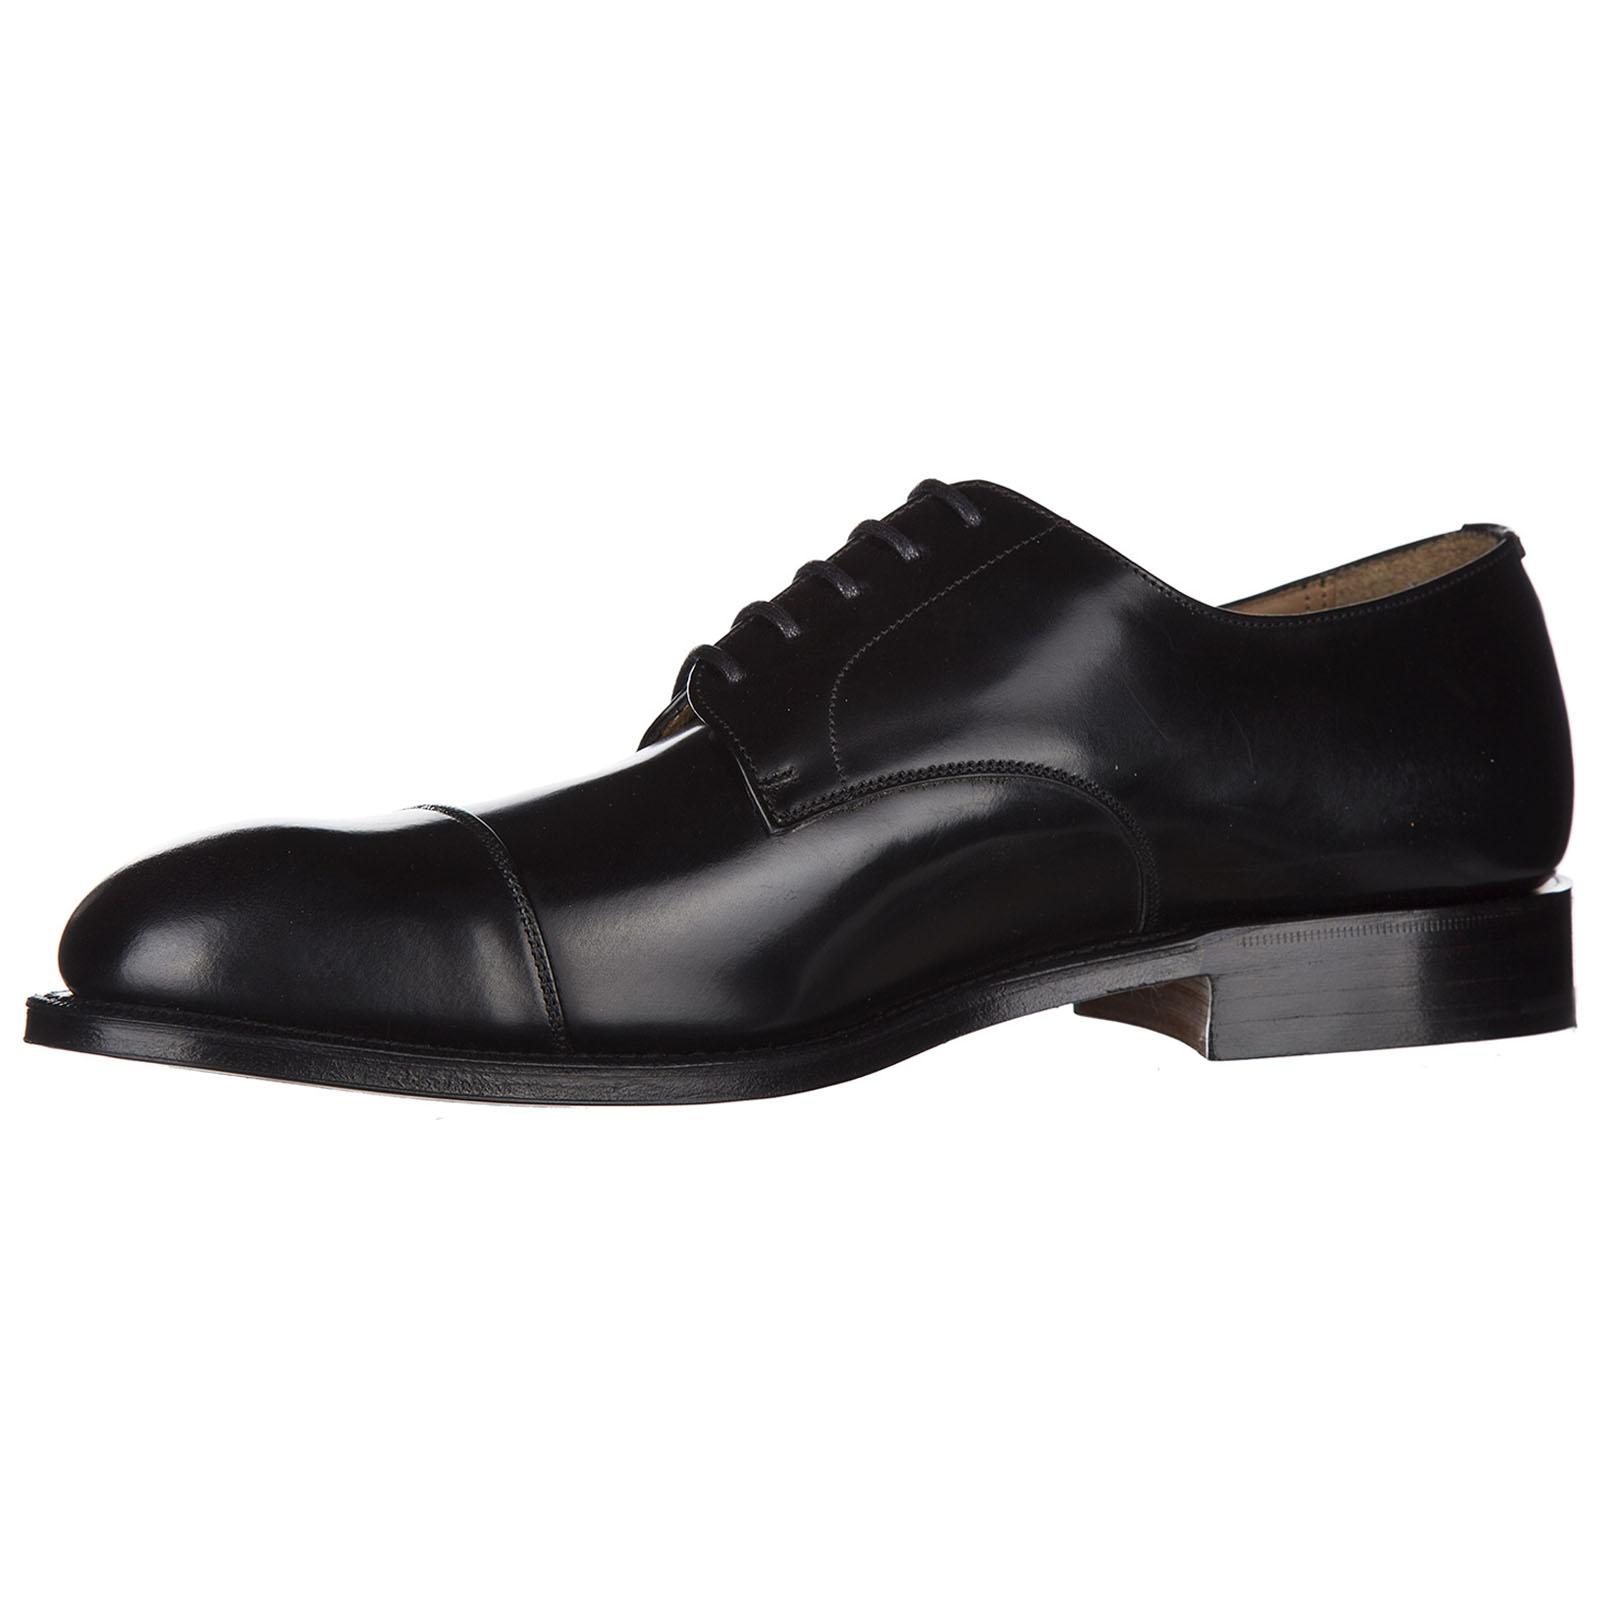 Cartmel 173 Chaussures Churchs hO7NKF3